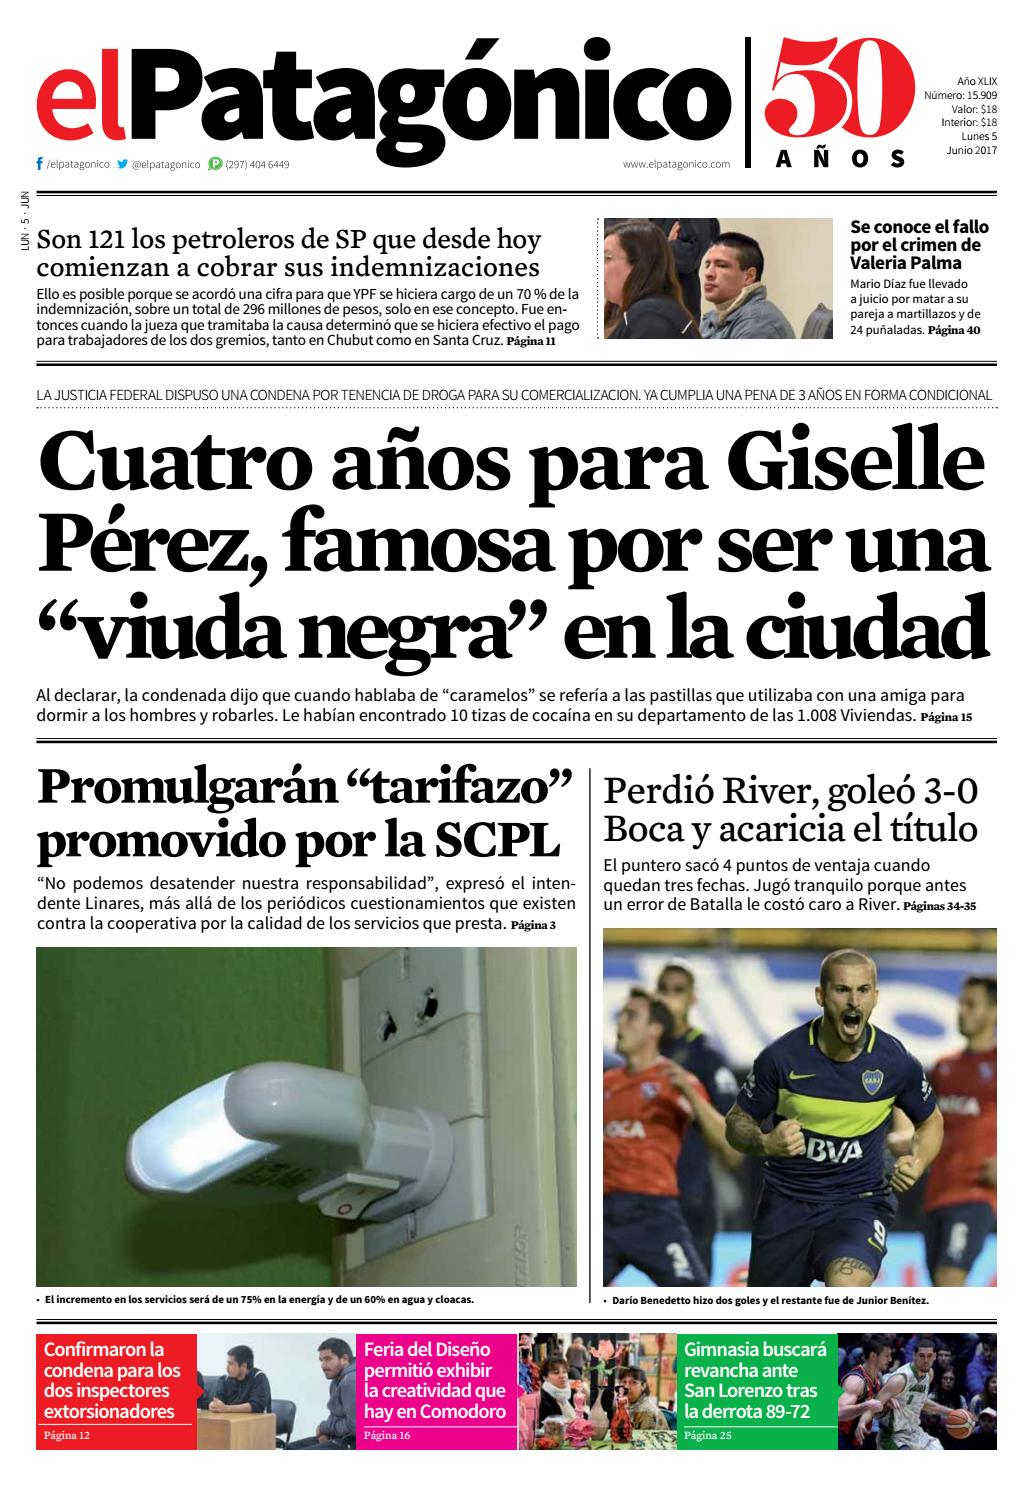 edicion221504062017.pdf by El Patagonico - issuu